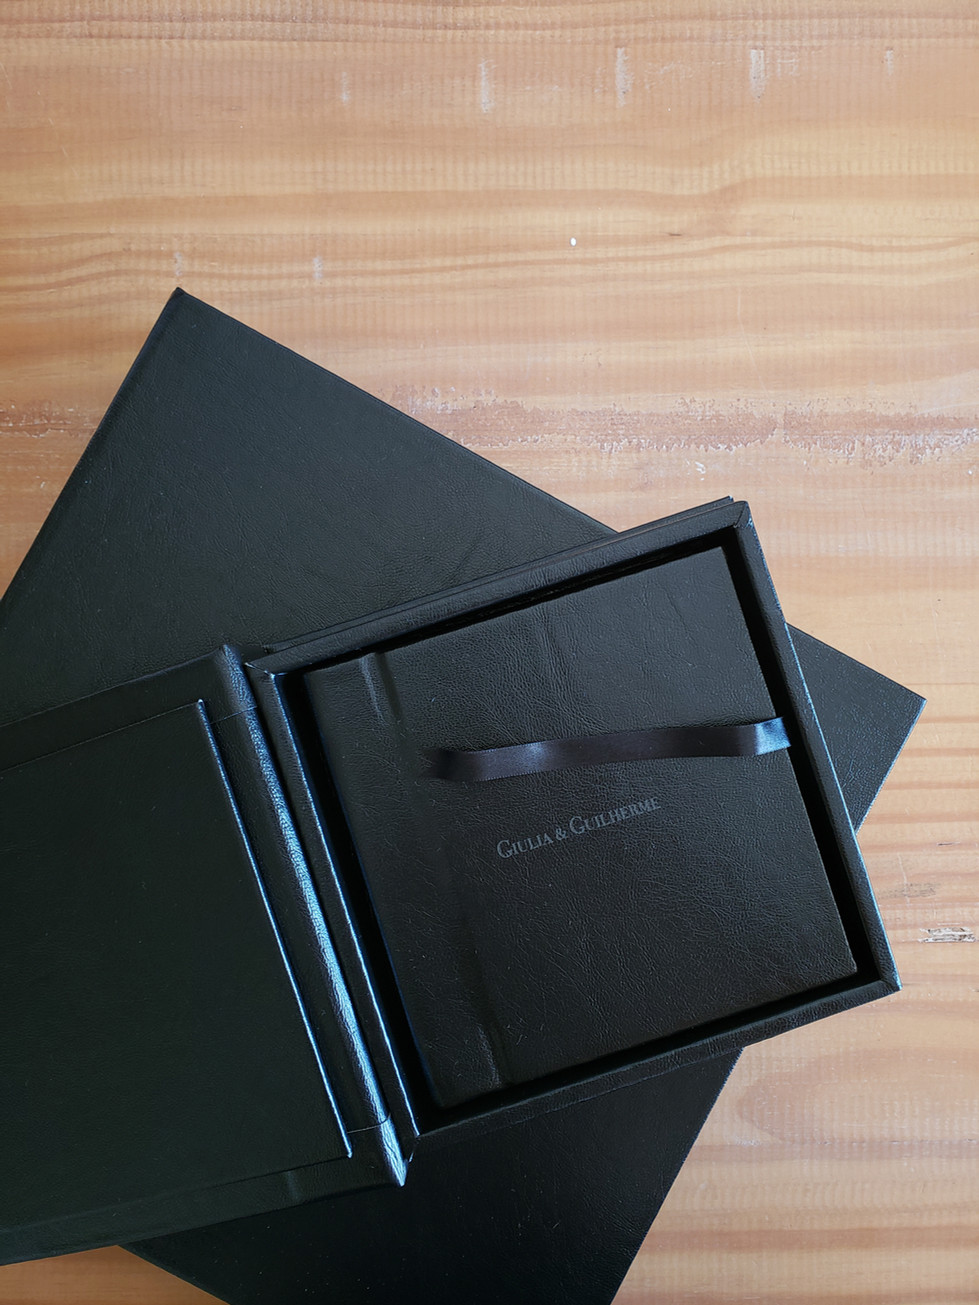 Álbum 30x30cm +Réplica 15x15cm